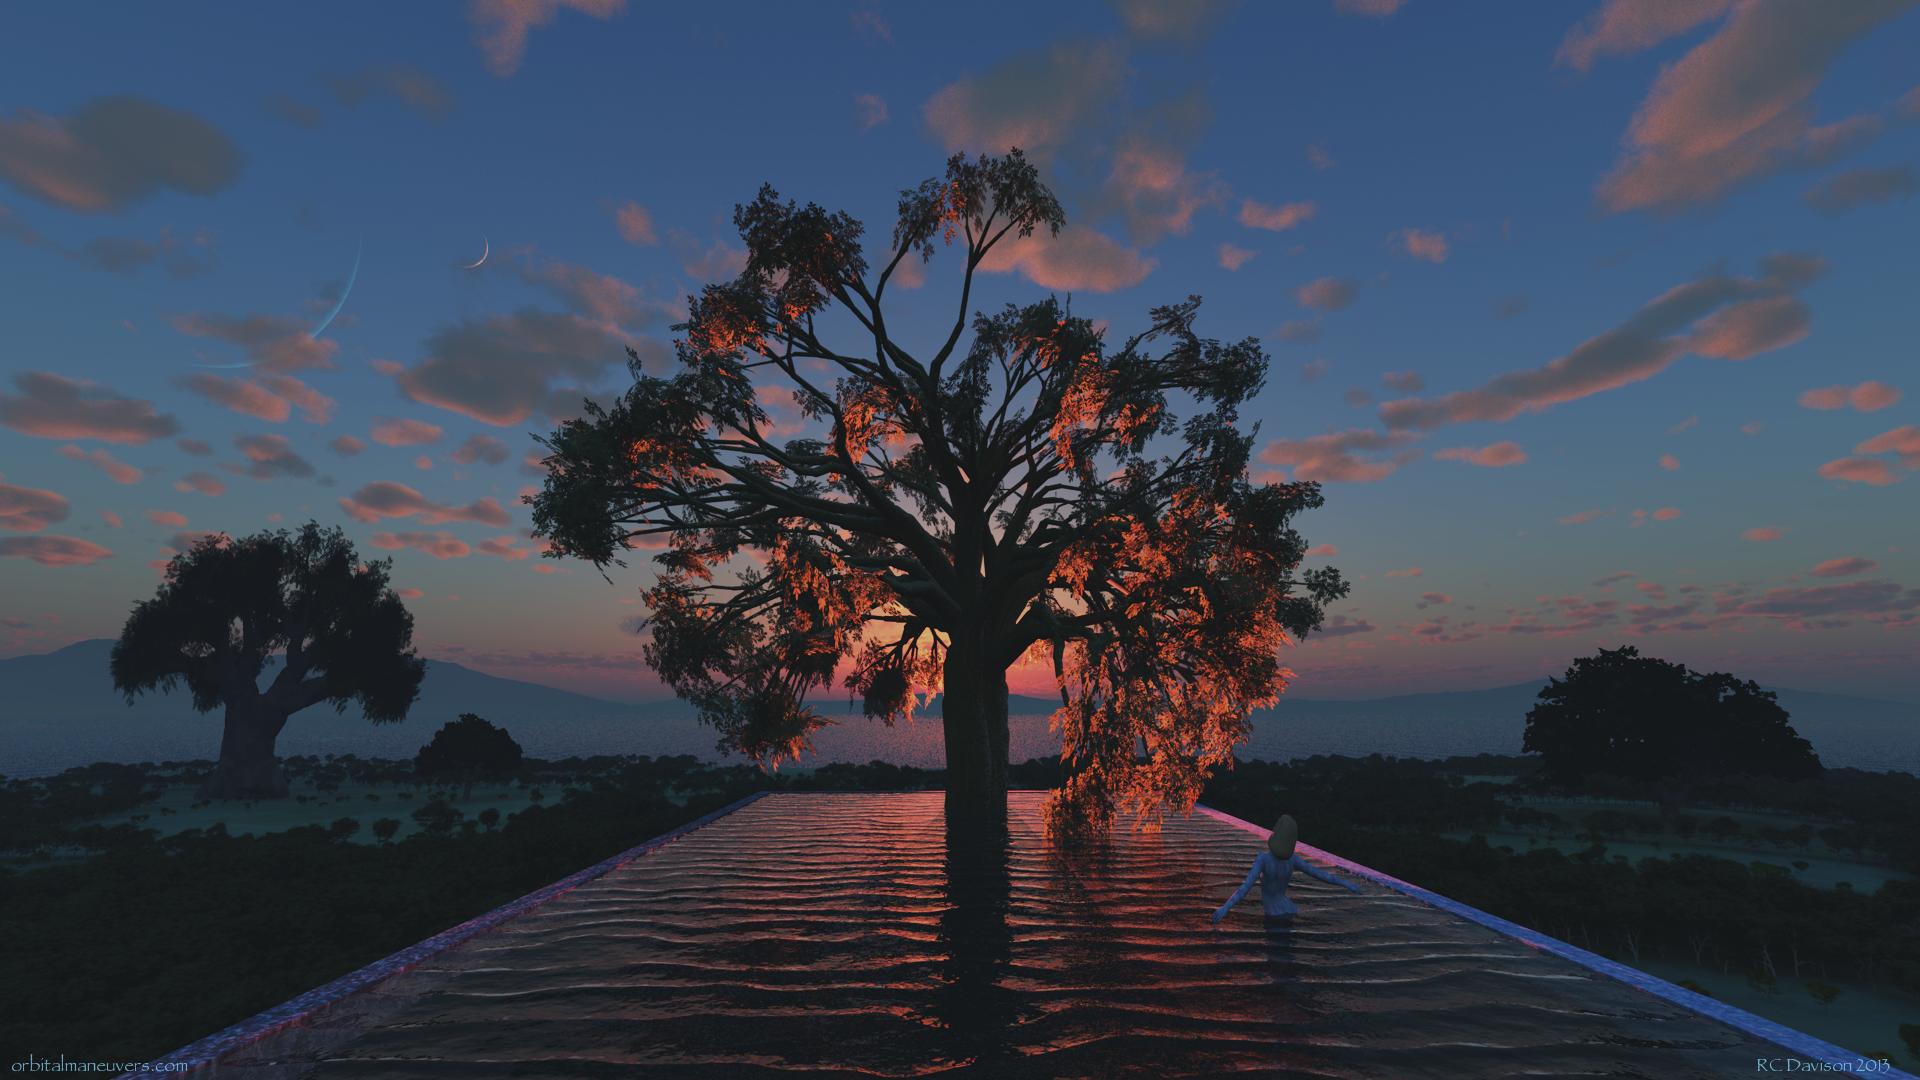 Free Download Wallpaper Tree Of Life Orbital Maneuvers 1920x1080